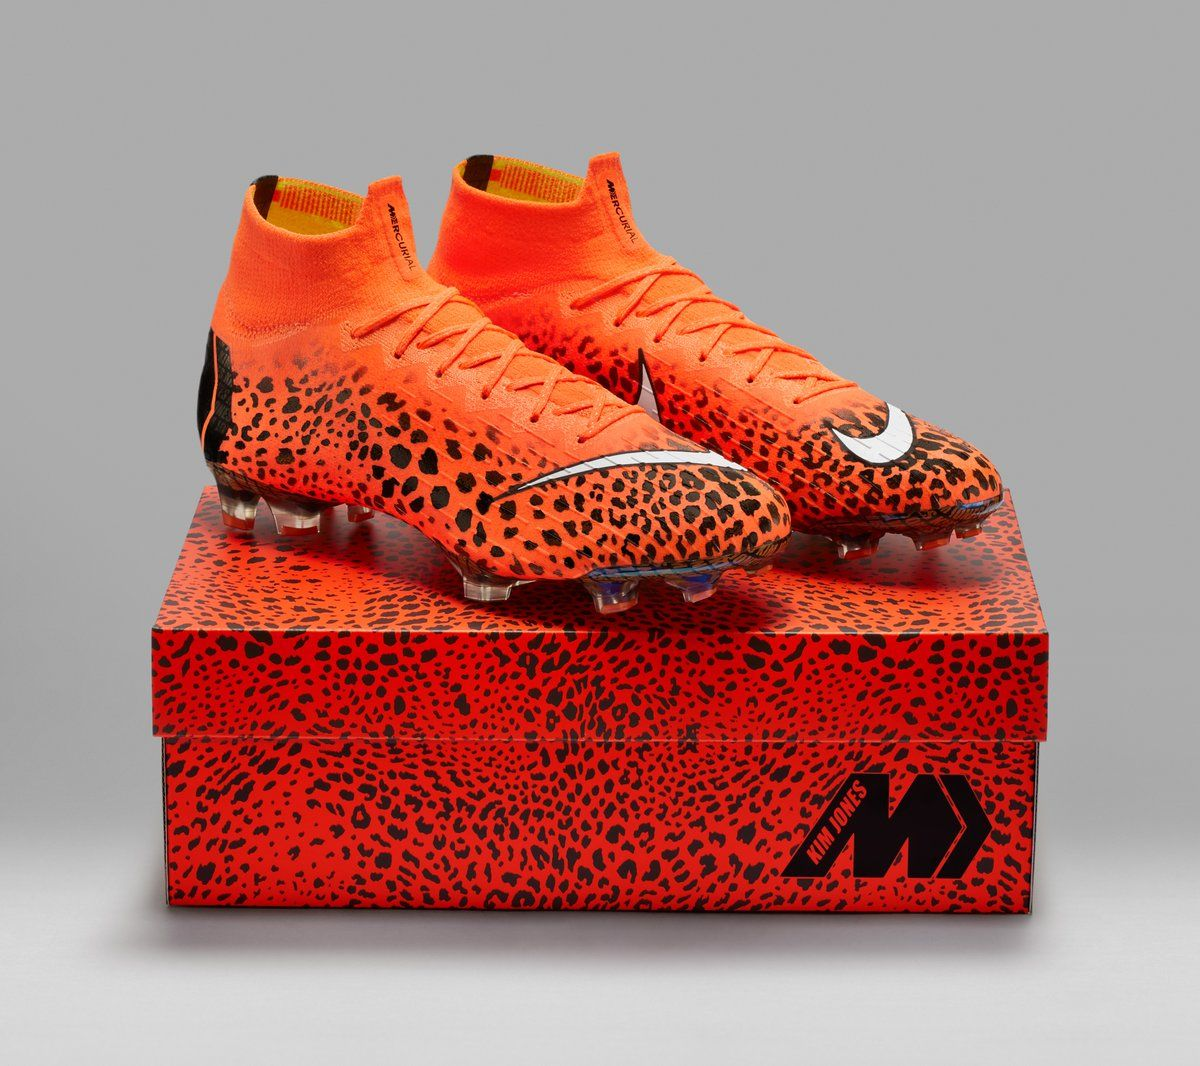 Nike Mercurial Superfly 360 x Kim Jones. Piel de Guepardo Gran Sport ... c618aebf21bc9